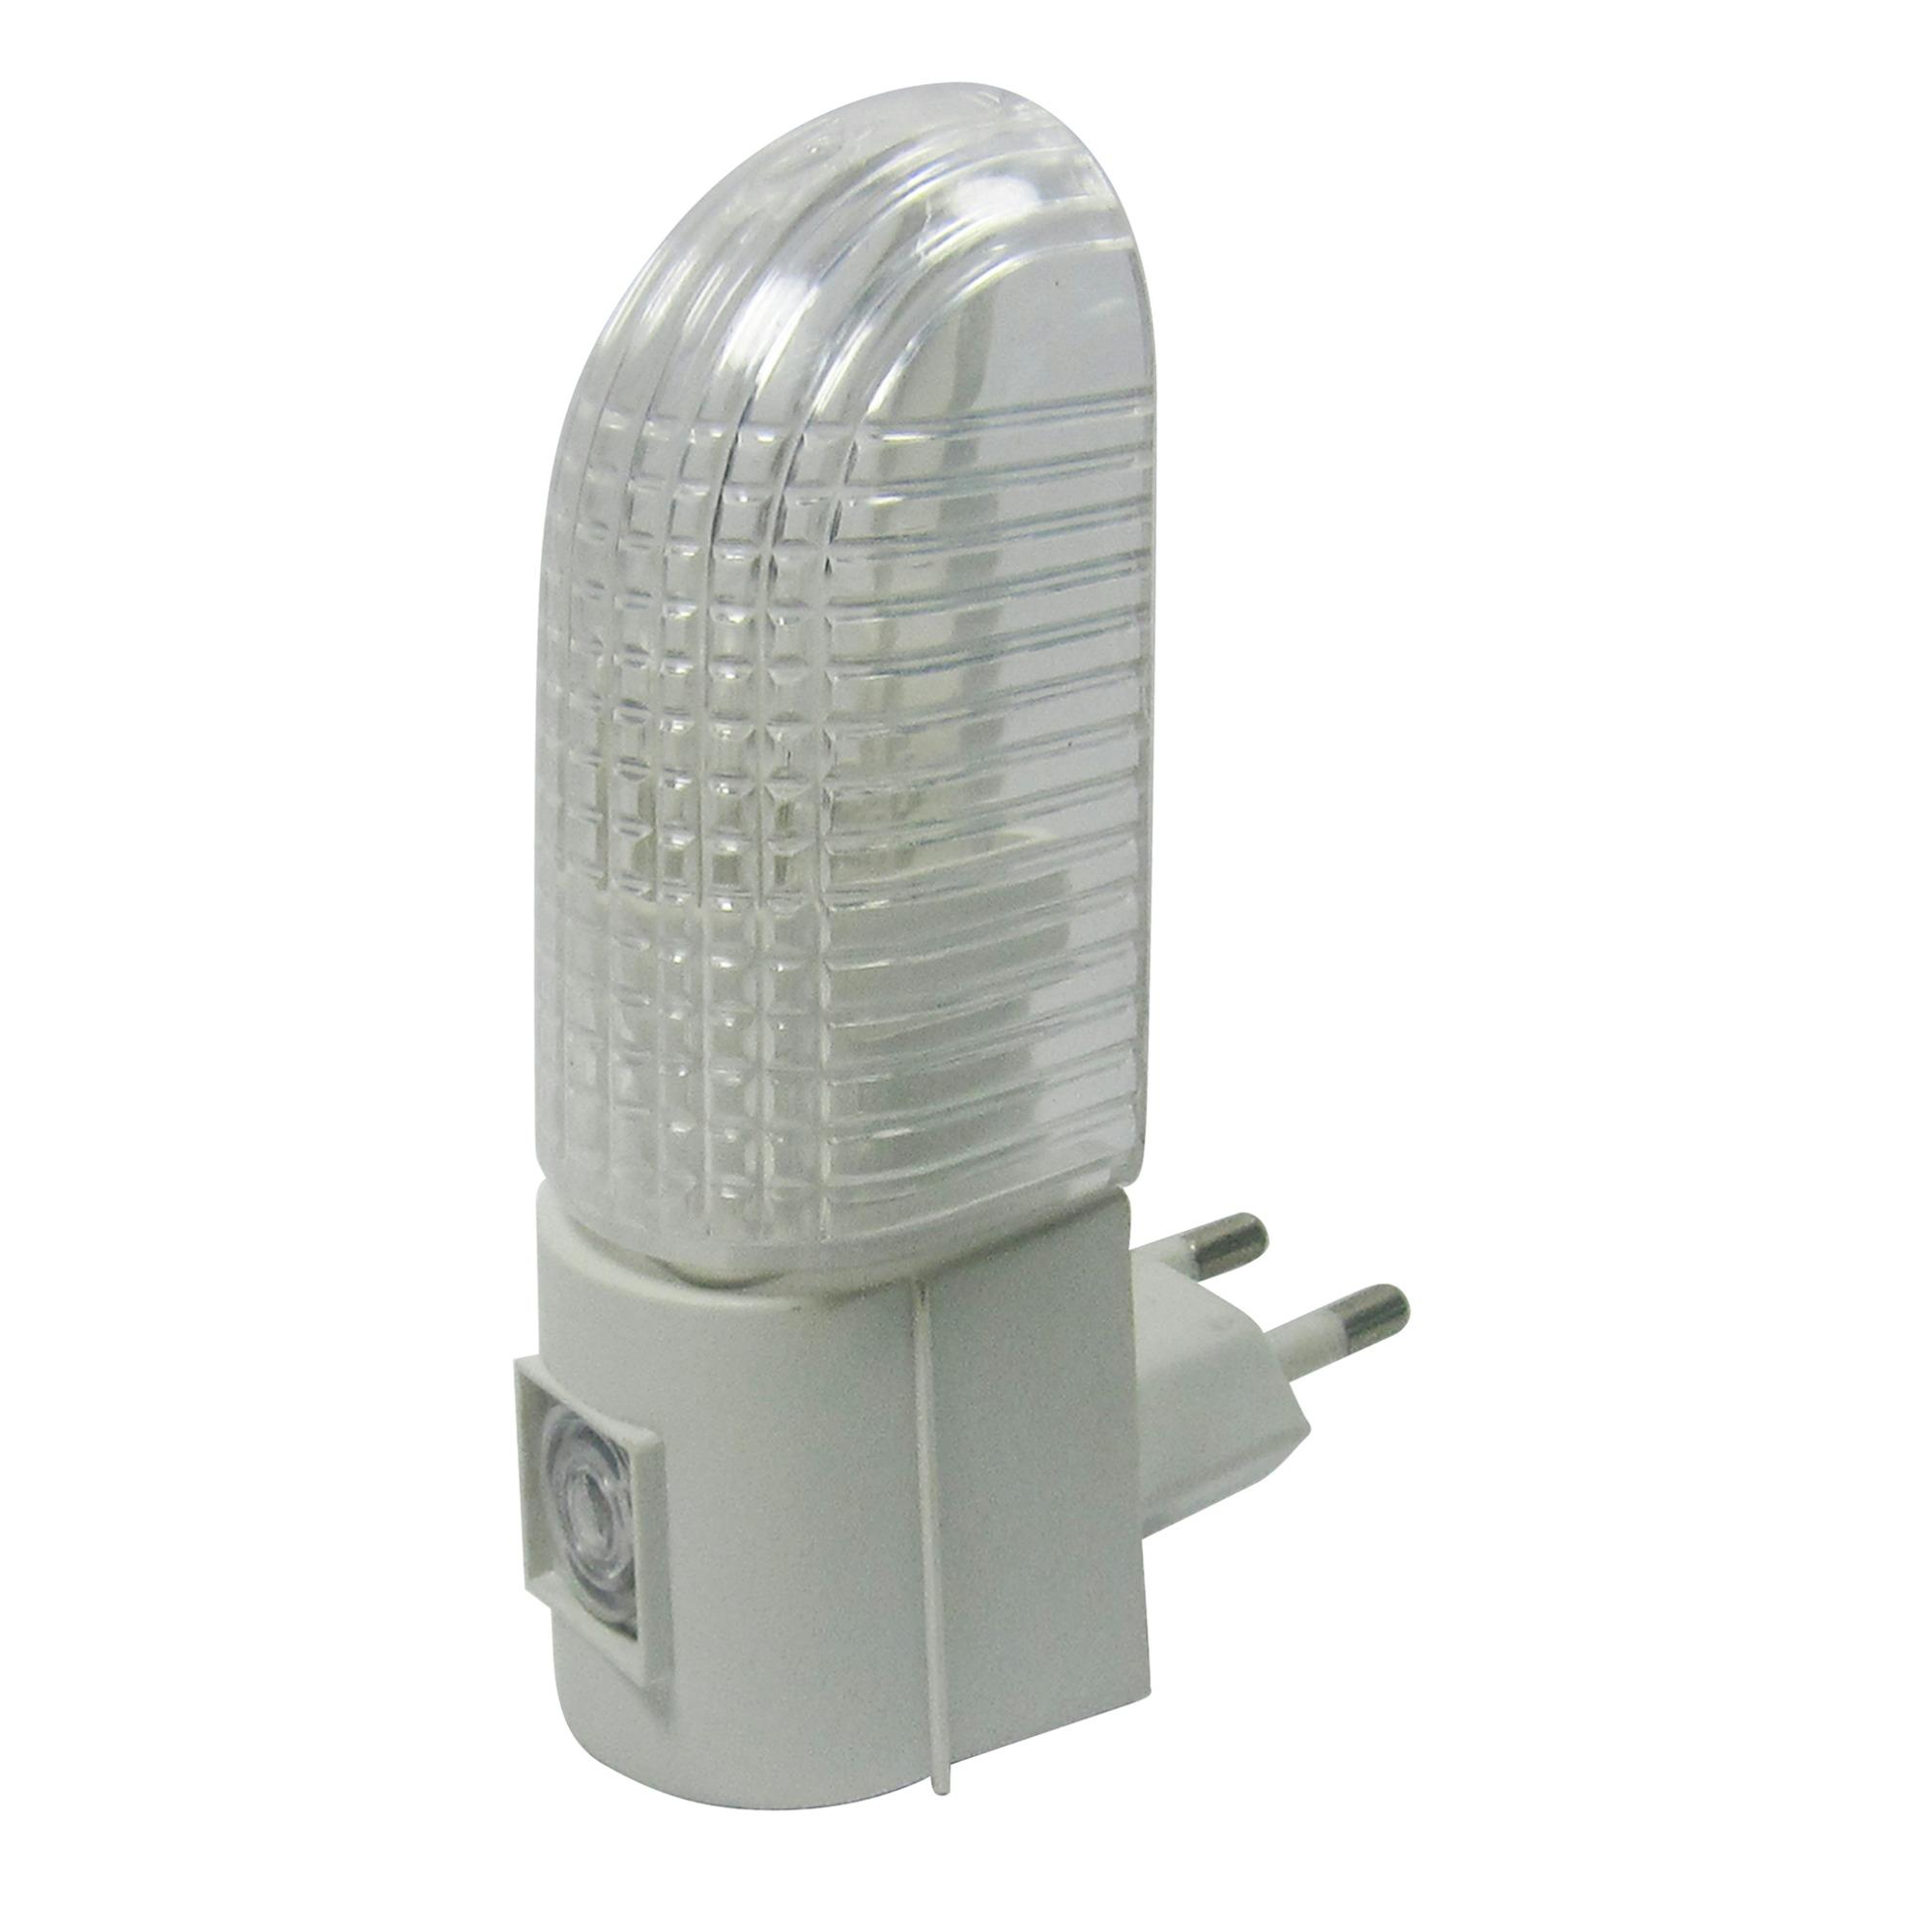 Buitenlamp Met Sensor Karwei.Nostalux Savoye I Recht Dagnacht Sensor Led